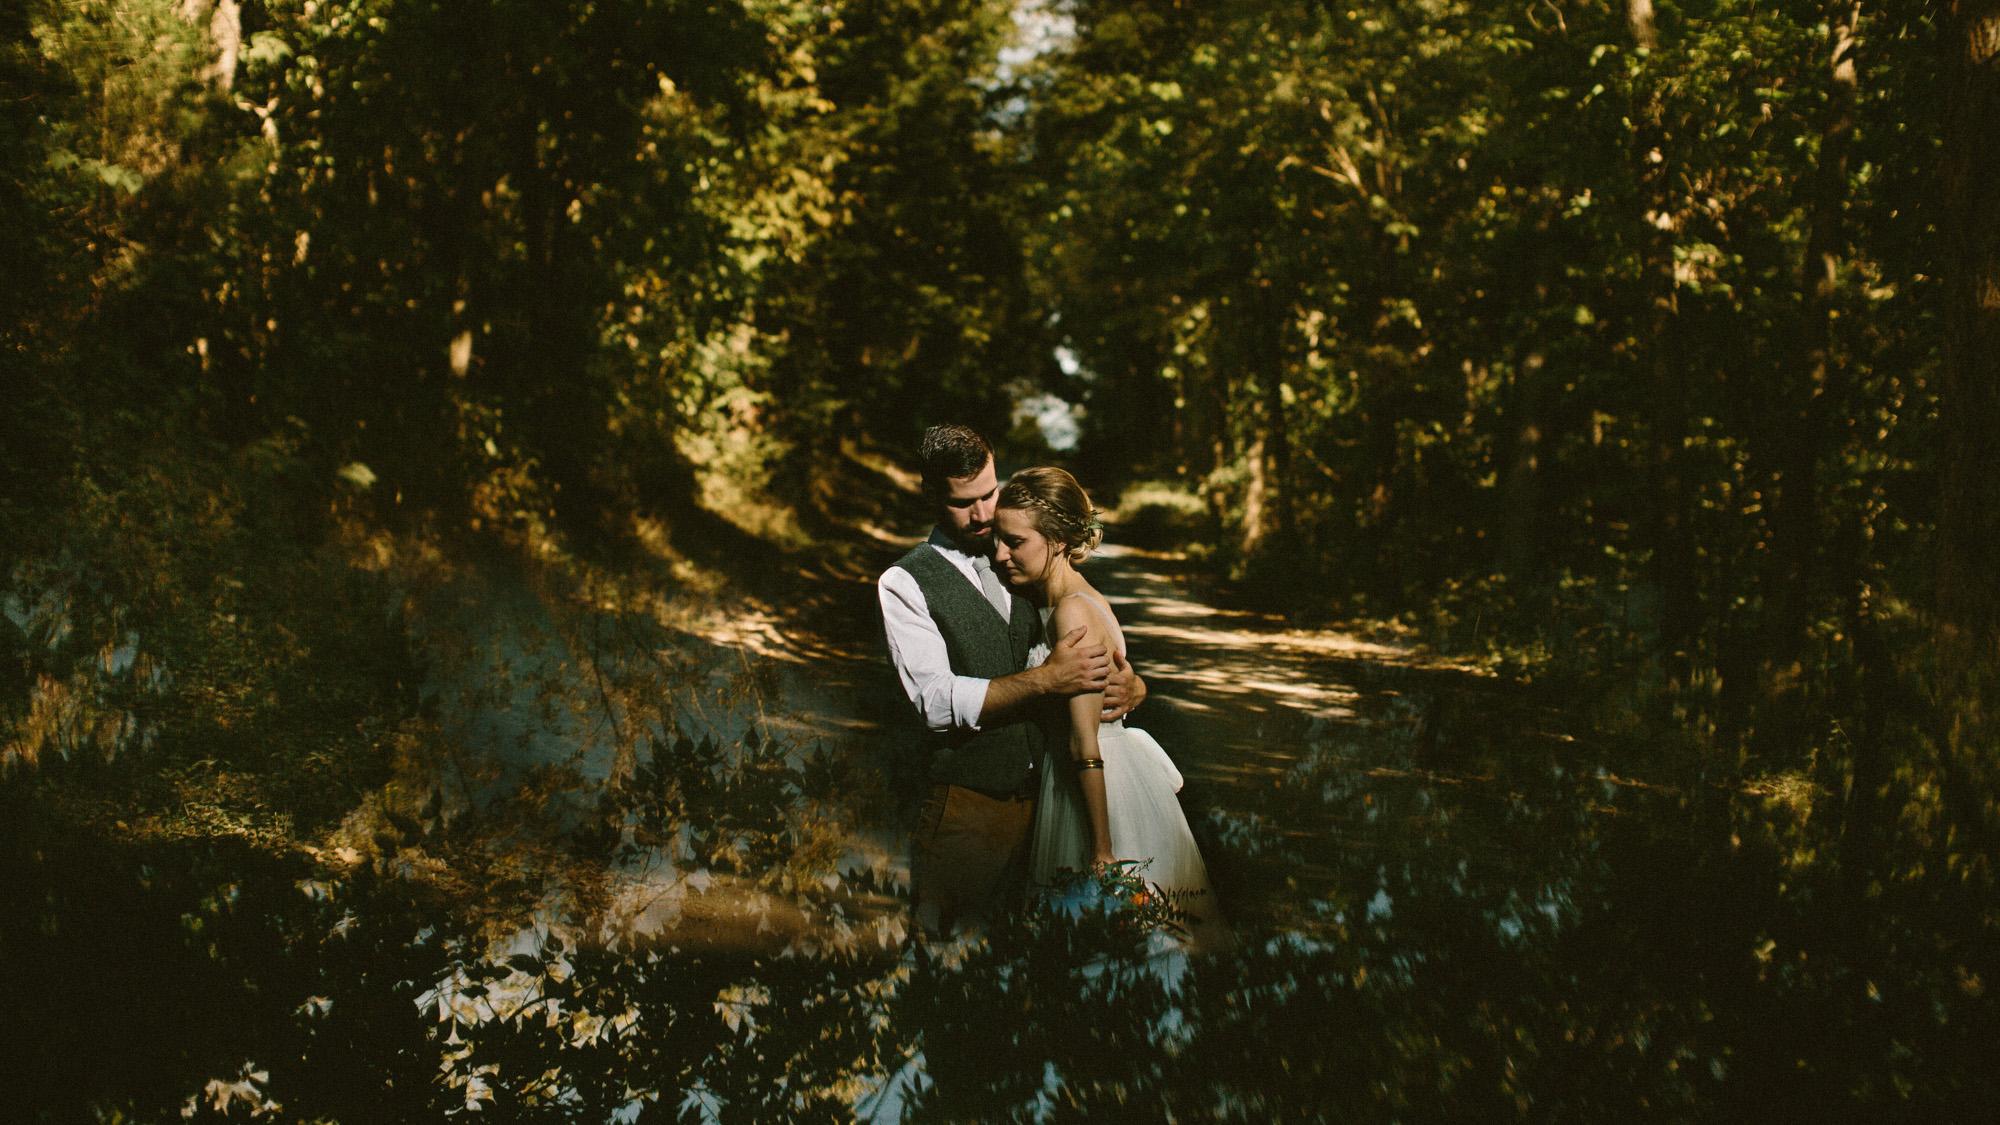 alec_vanderboom_springfield_missouri_wedding-0055.jpg